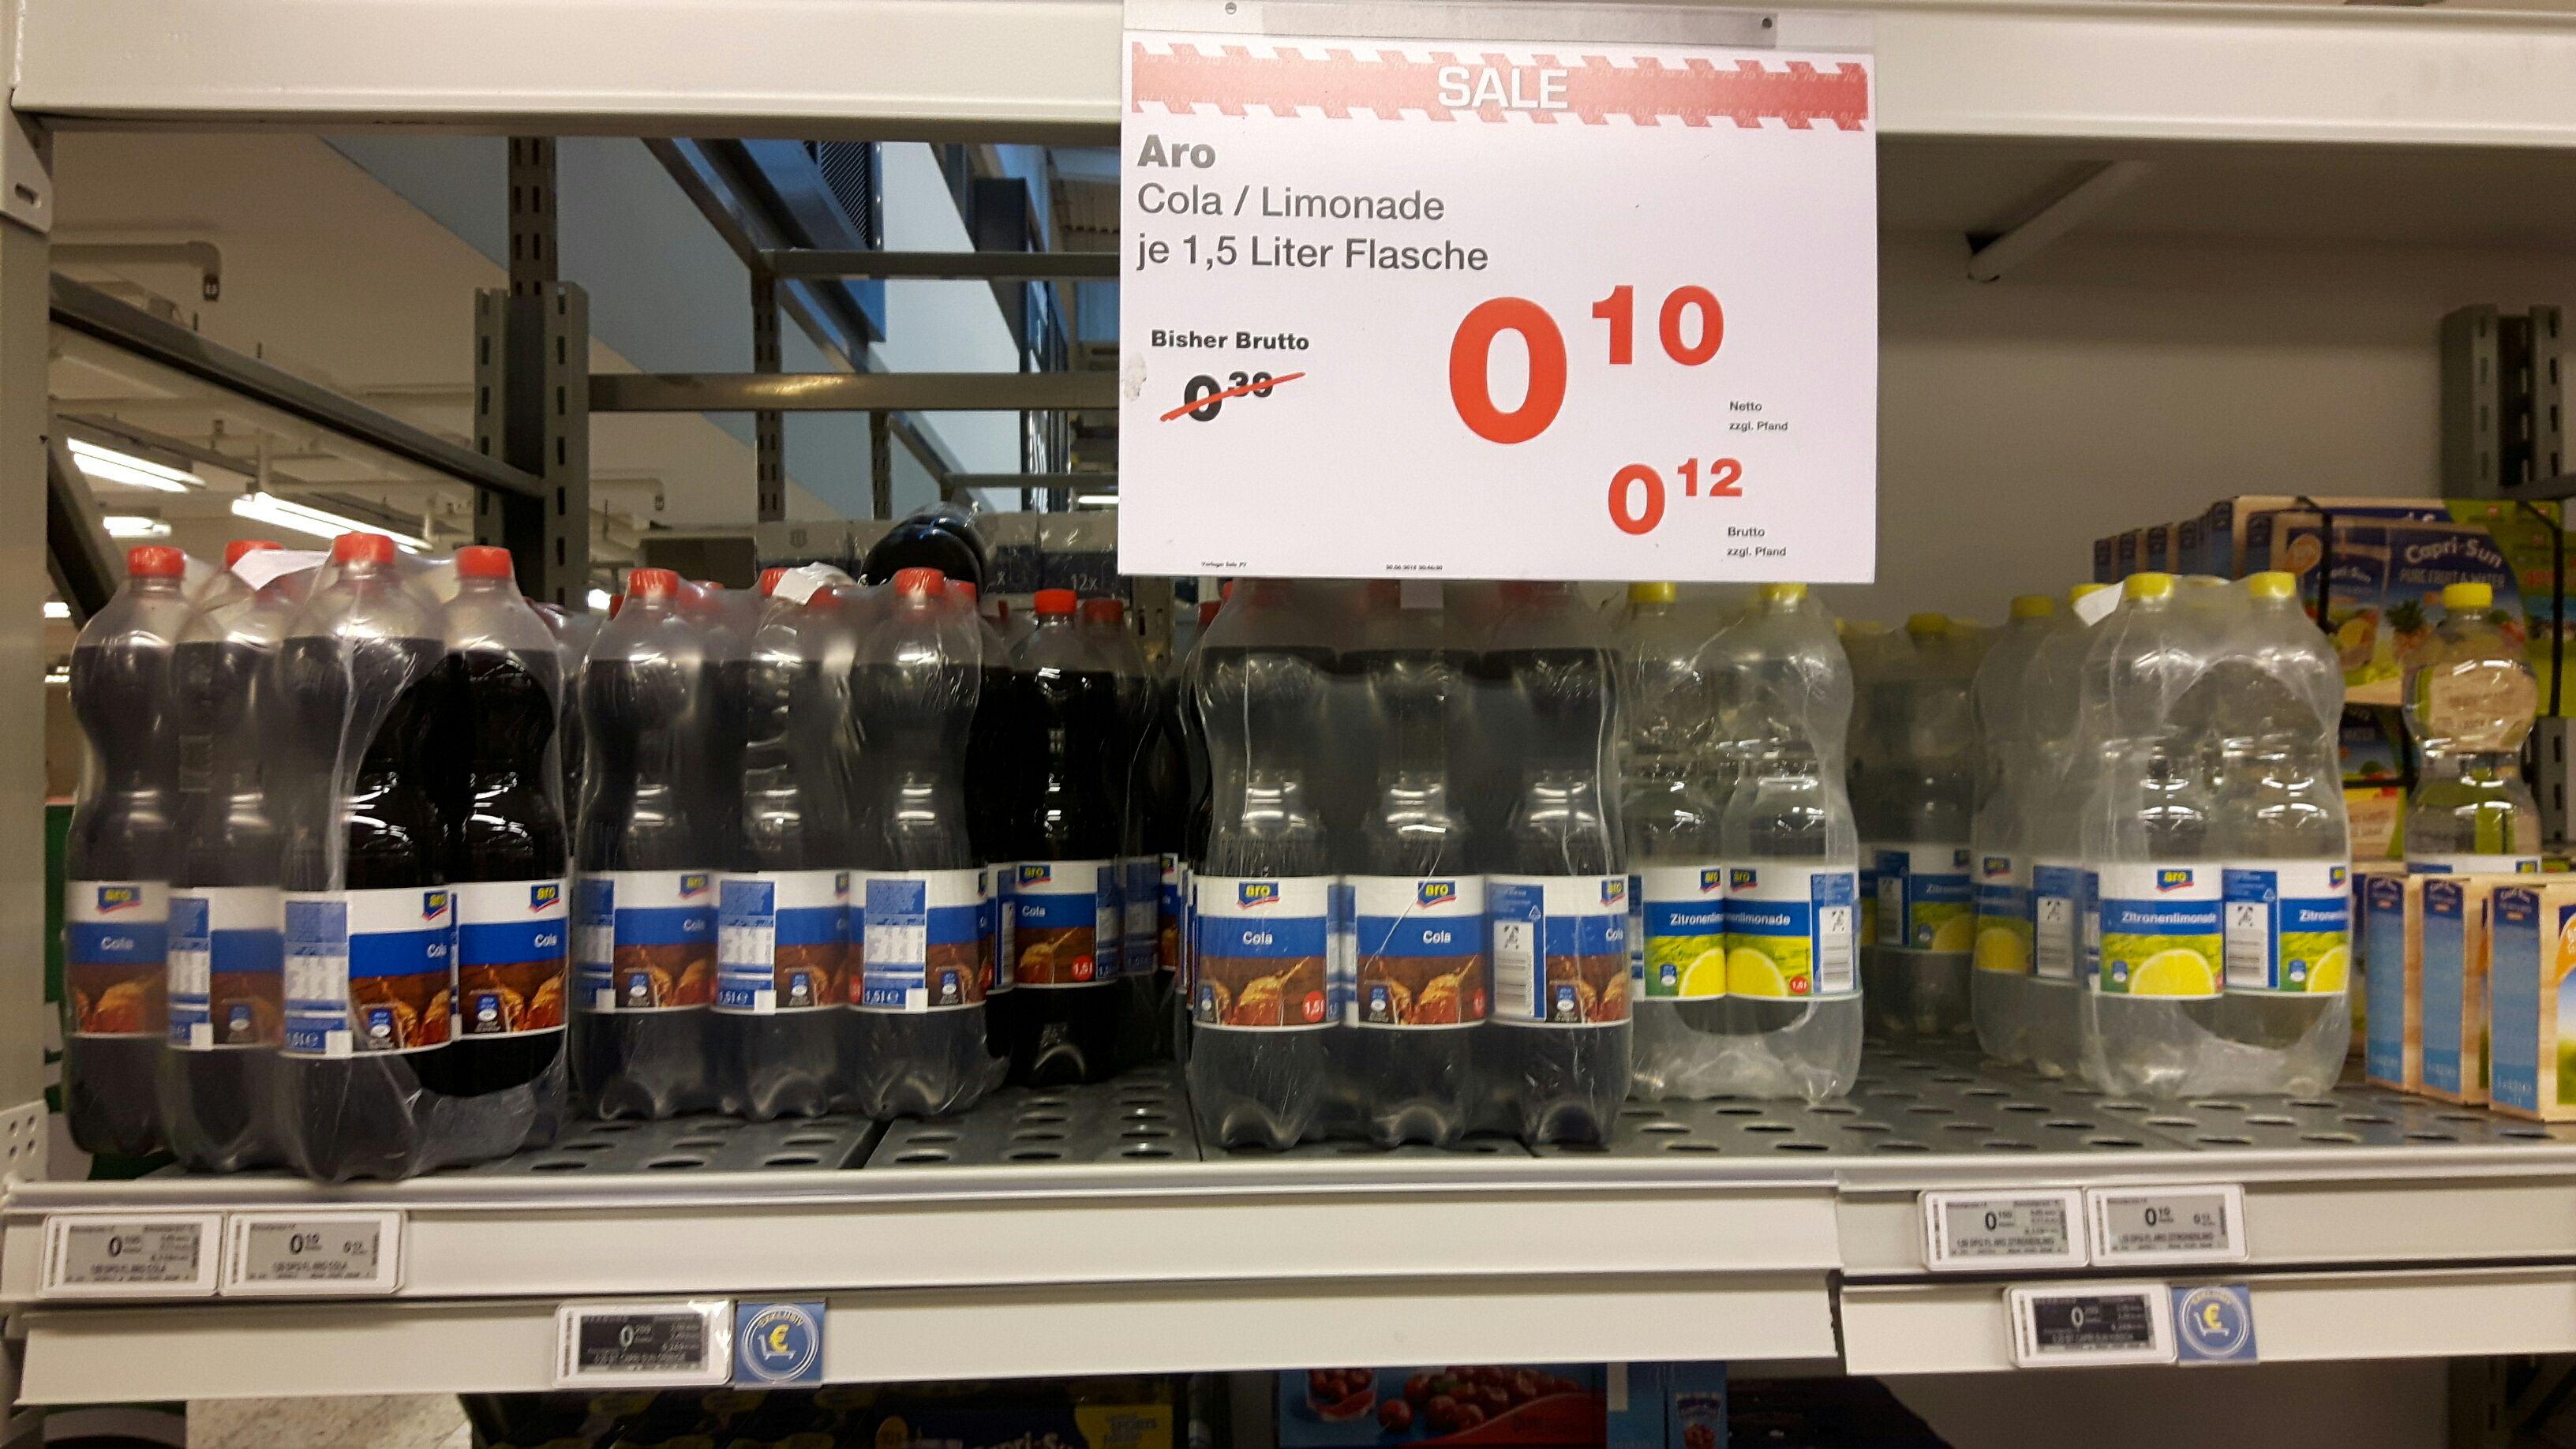 [METRO Düsseldorf] aro klare Zitronenlimo oder aro Cola 1,5l PET-Flasche